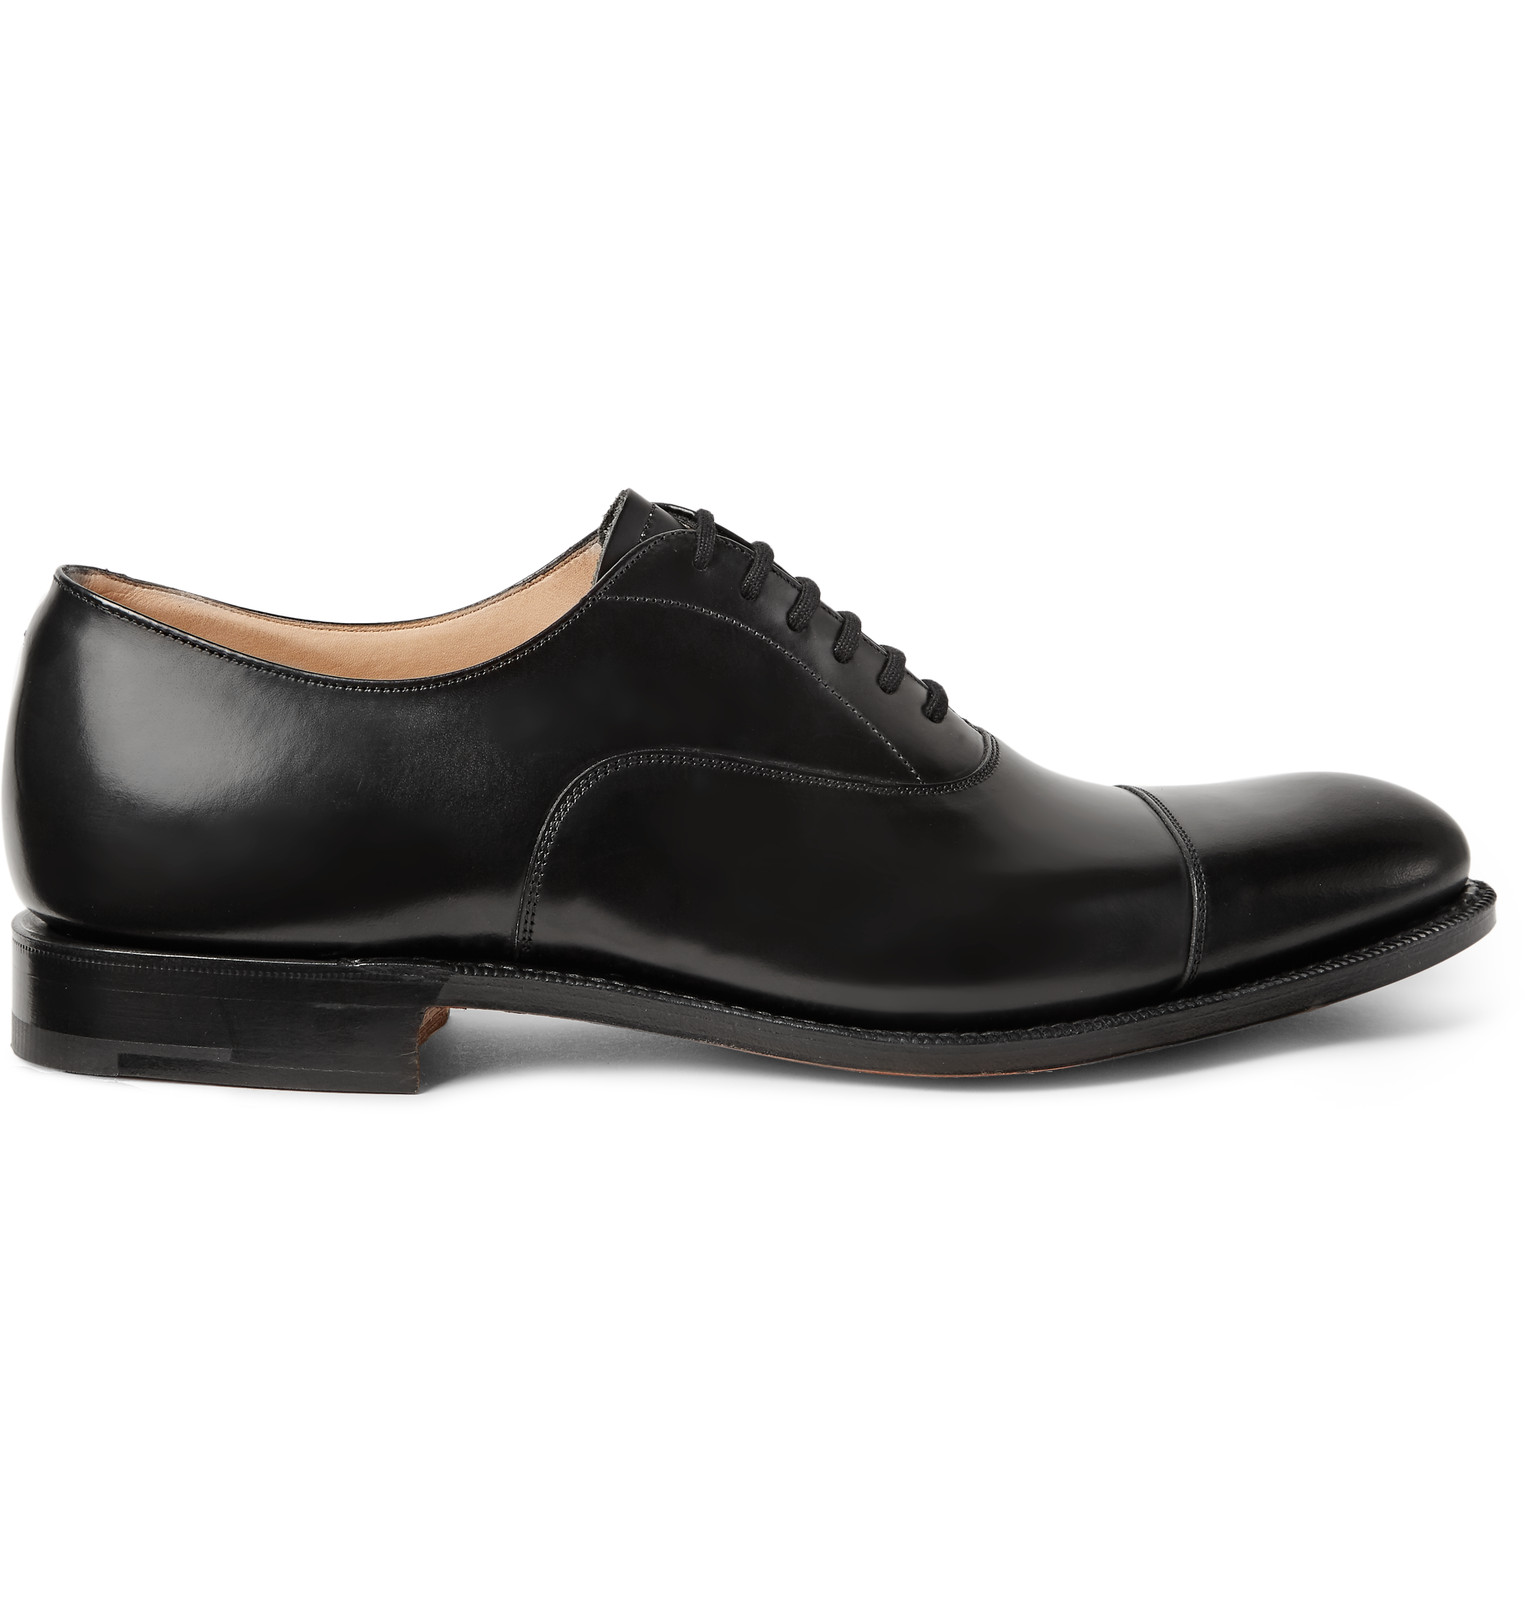 dba006447f2 Church s - Dubai Polished-Leather Oxford Shoes